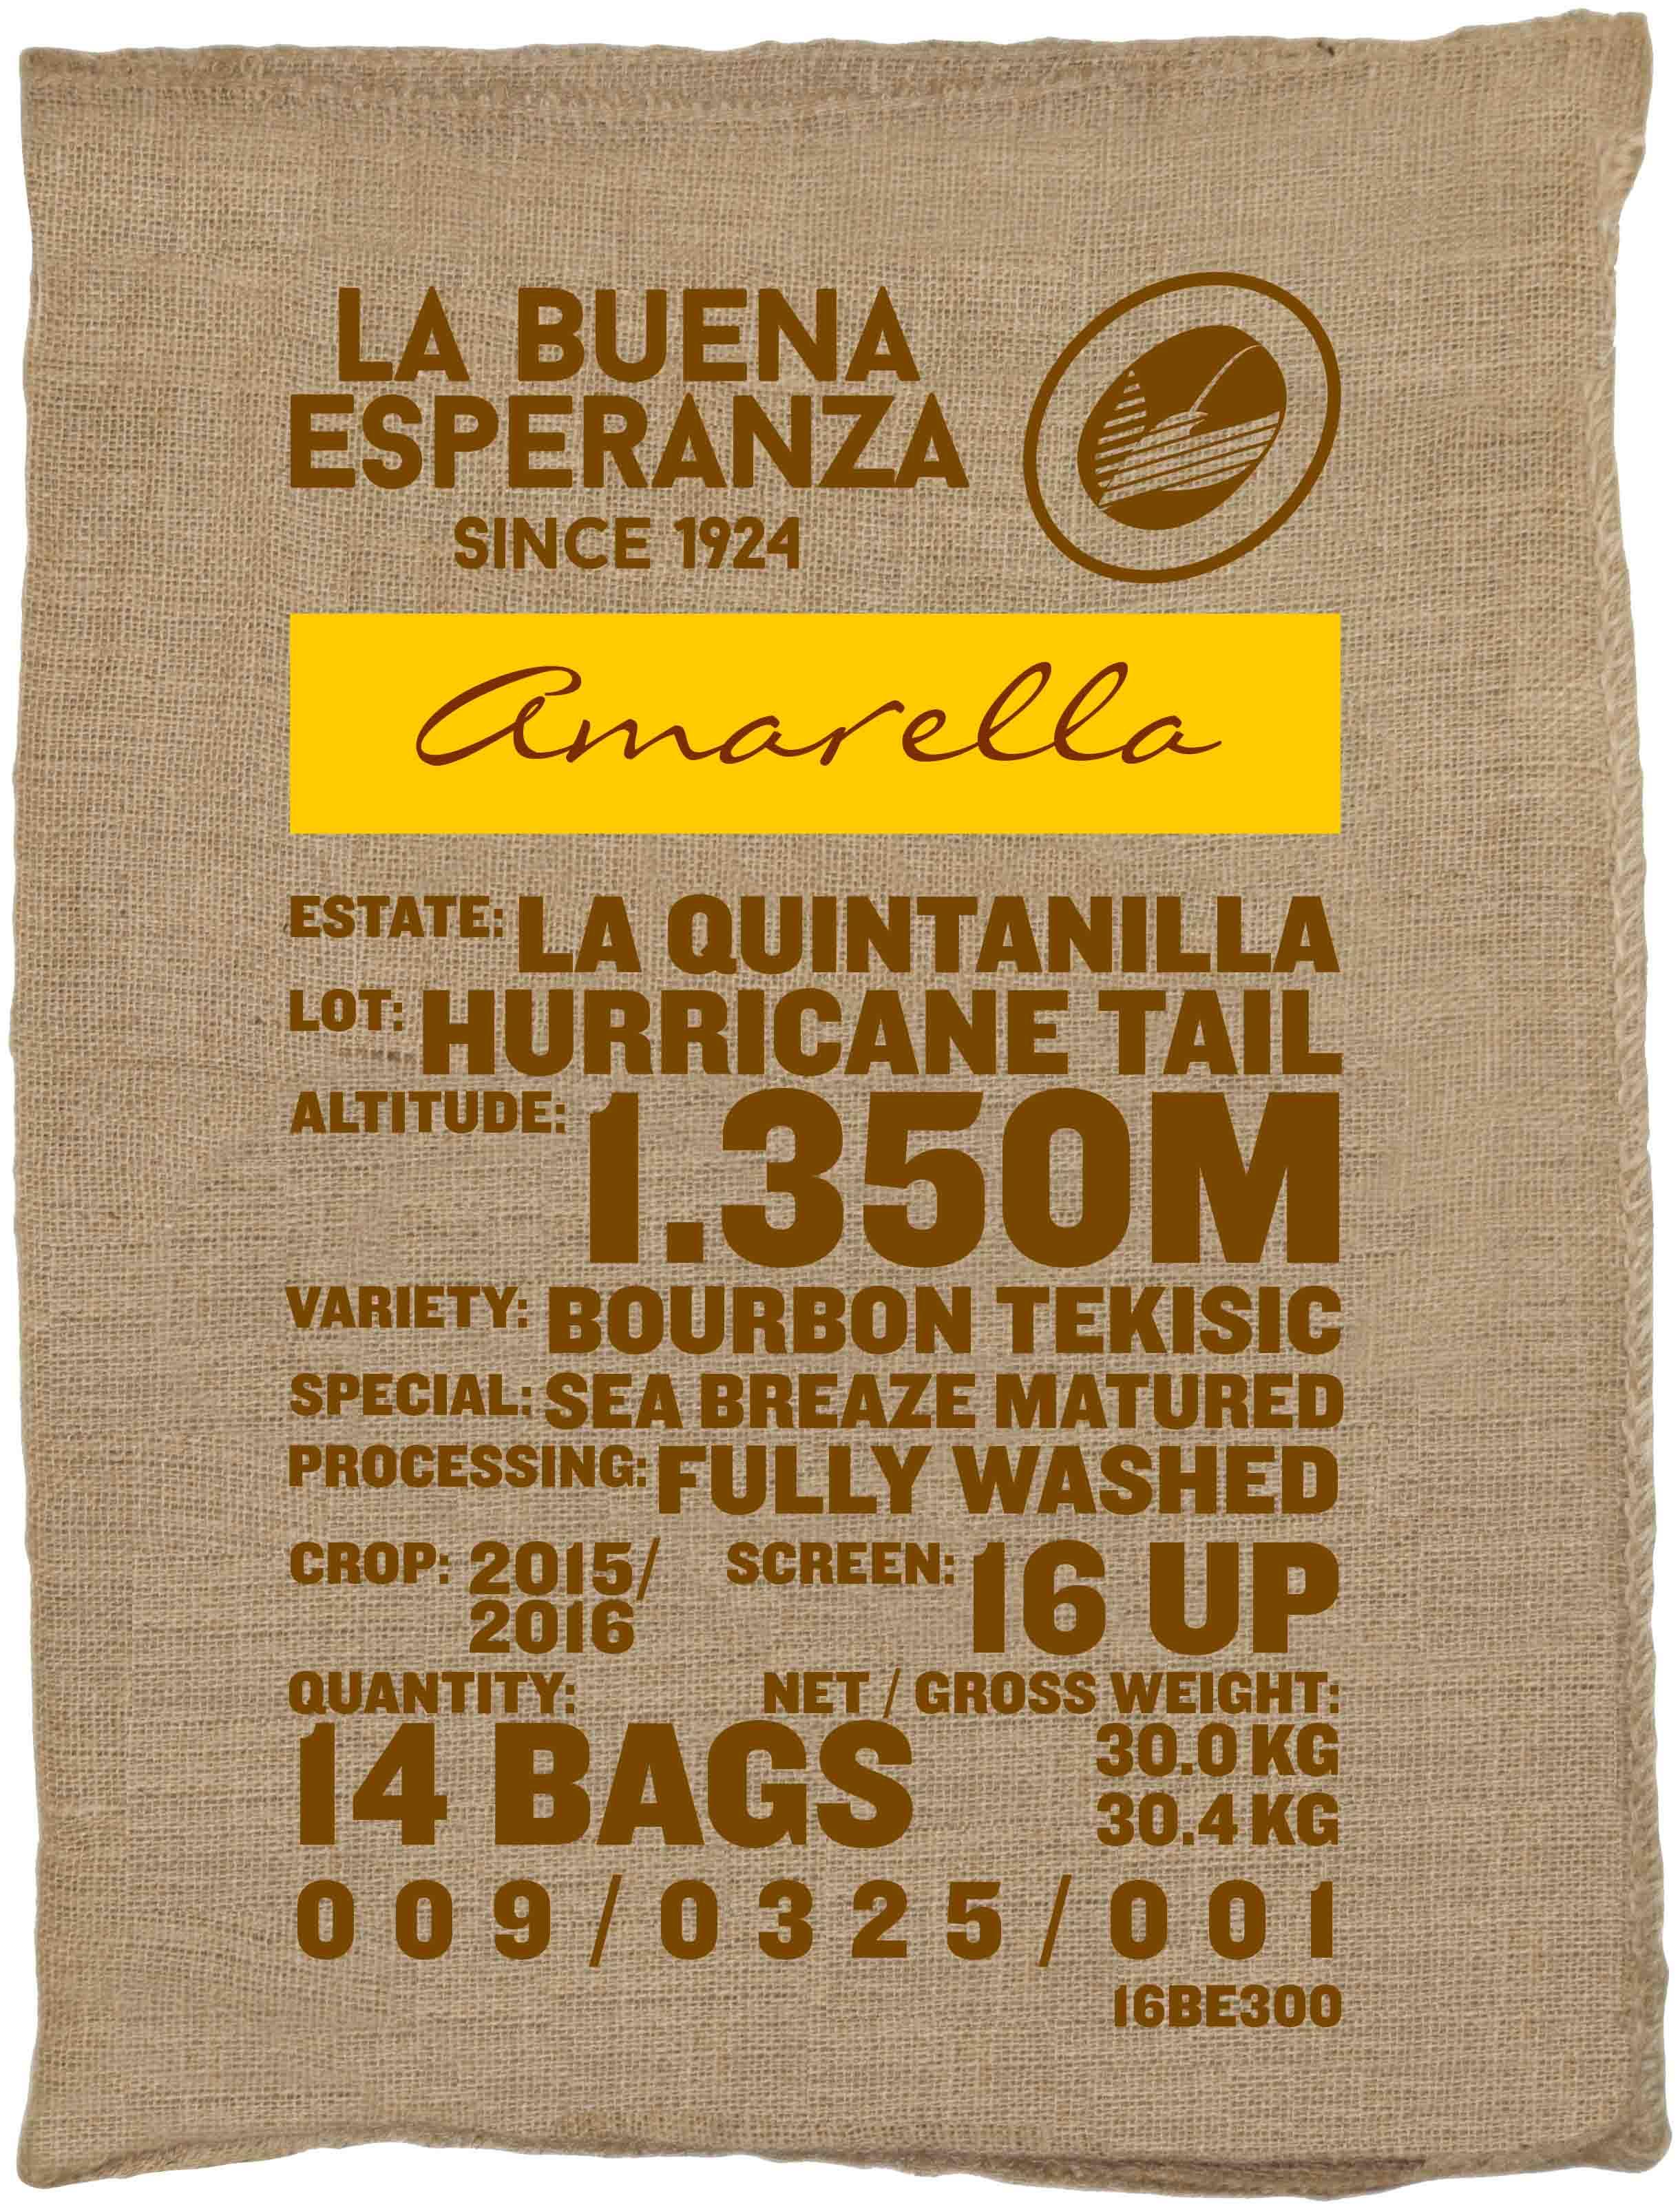 Ein Rohaffeesack amarella Parzellenkaffee Varietät Bourbon Tekisic. Finca La Buena Esperanza Lot Hurricane Tail.